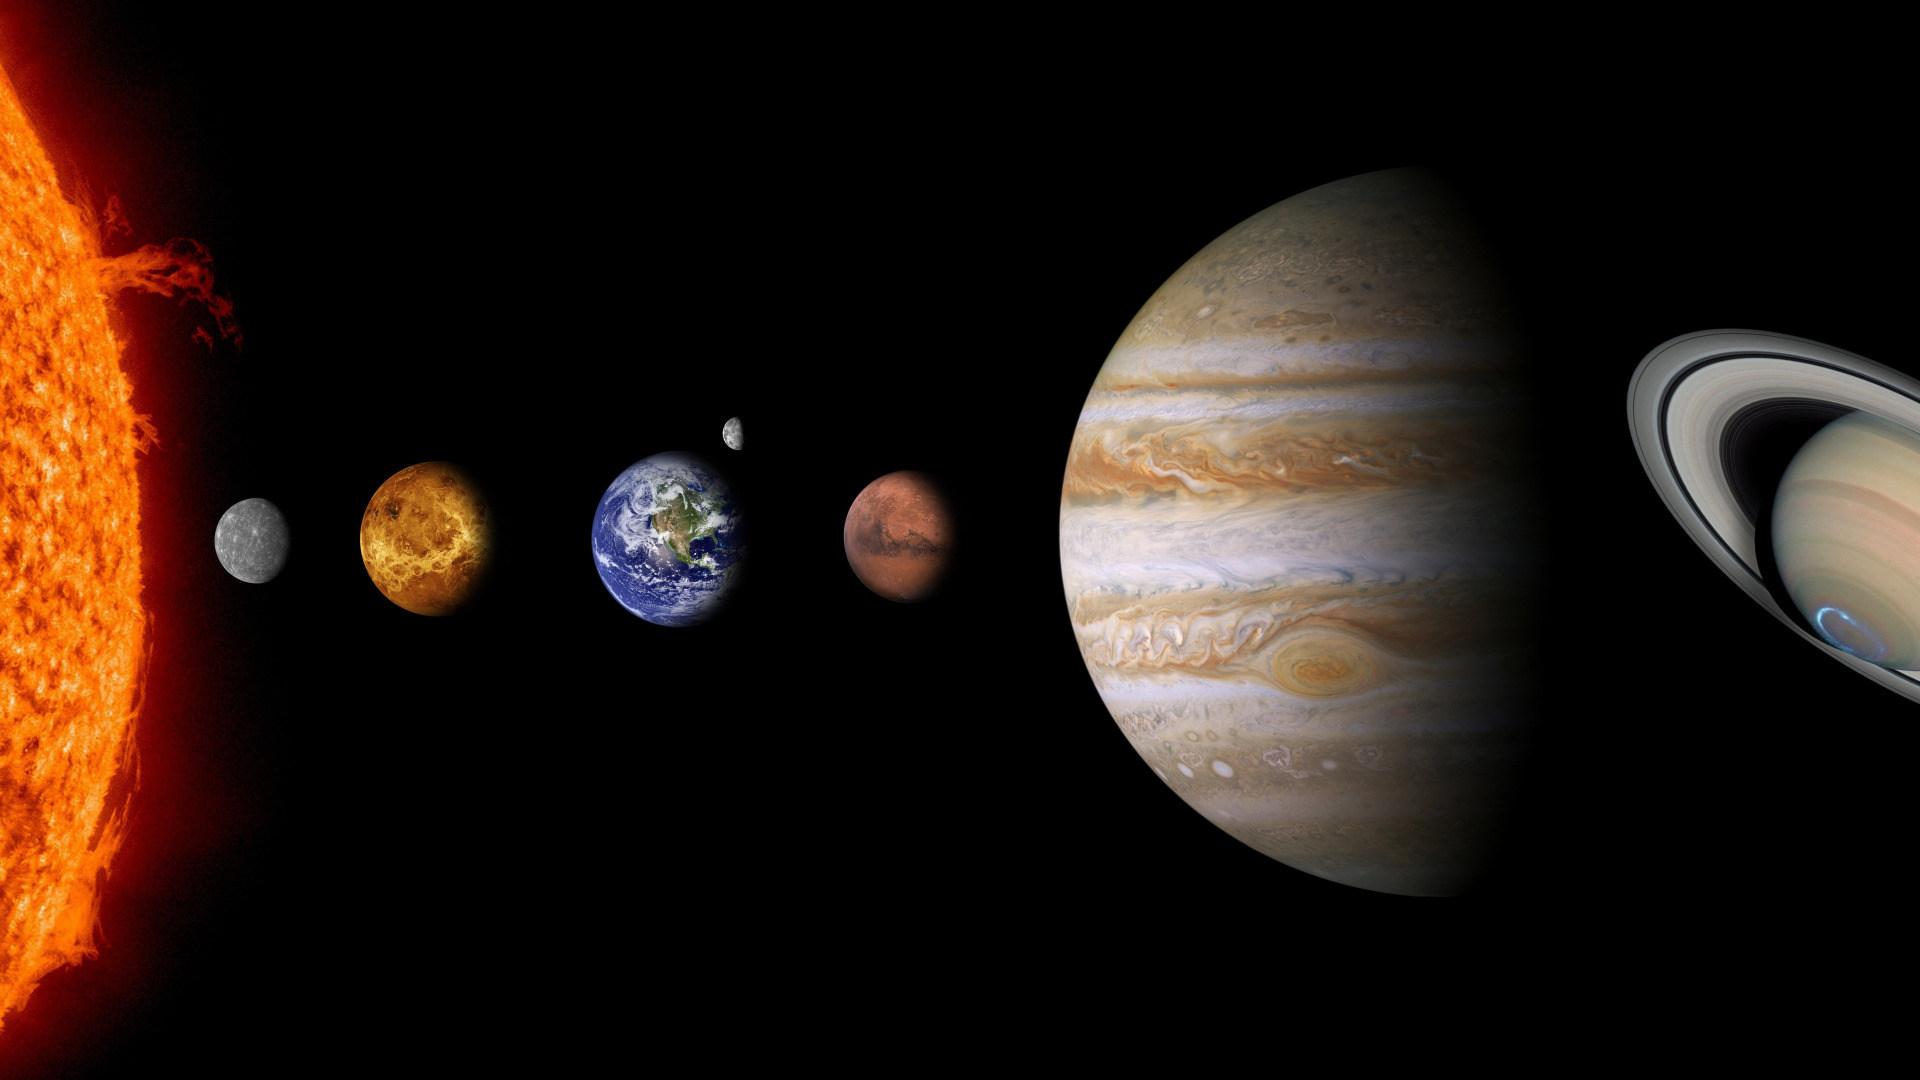 Video, Forschung, Kamera, Virtual Reality, Weltraum, Bilder, Videos, Raumfahrt, Nasa, 3d, Bild, Mars, Sonde, rover, Panorama, Bildanalyse, Mars-Rover, open-source, Mars 2020, Umgebung, Mastcam-Z, Perseverance, 3D-Bilder, Visualisierungswerkzeug